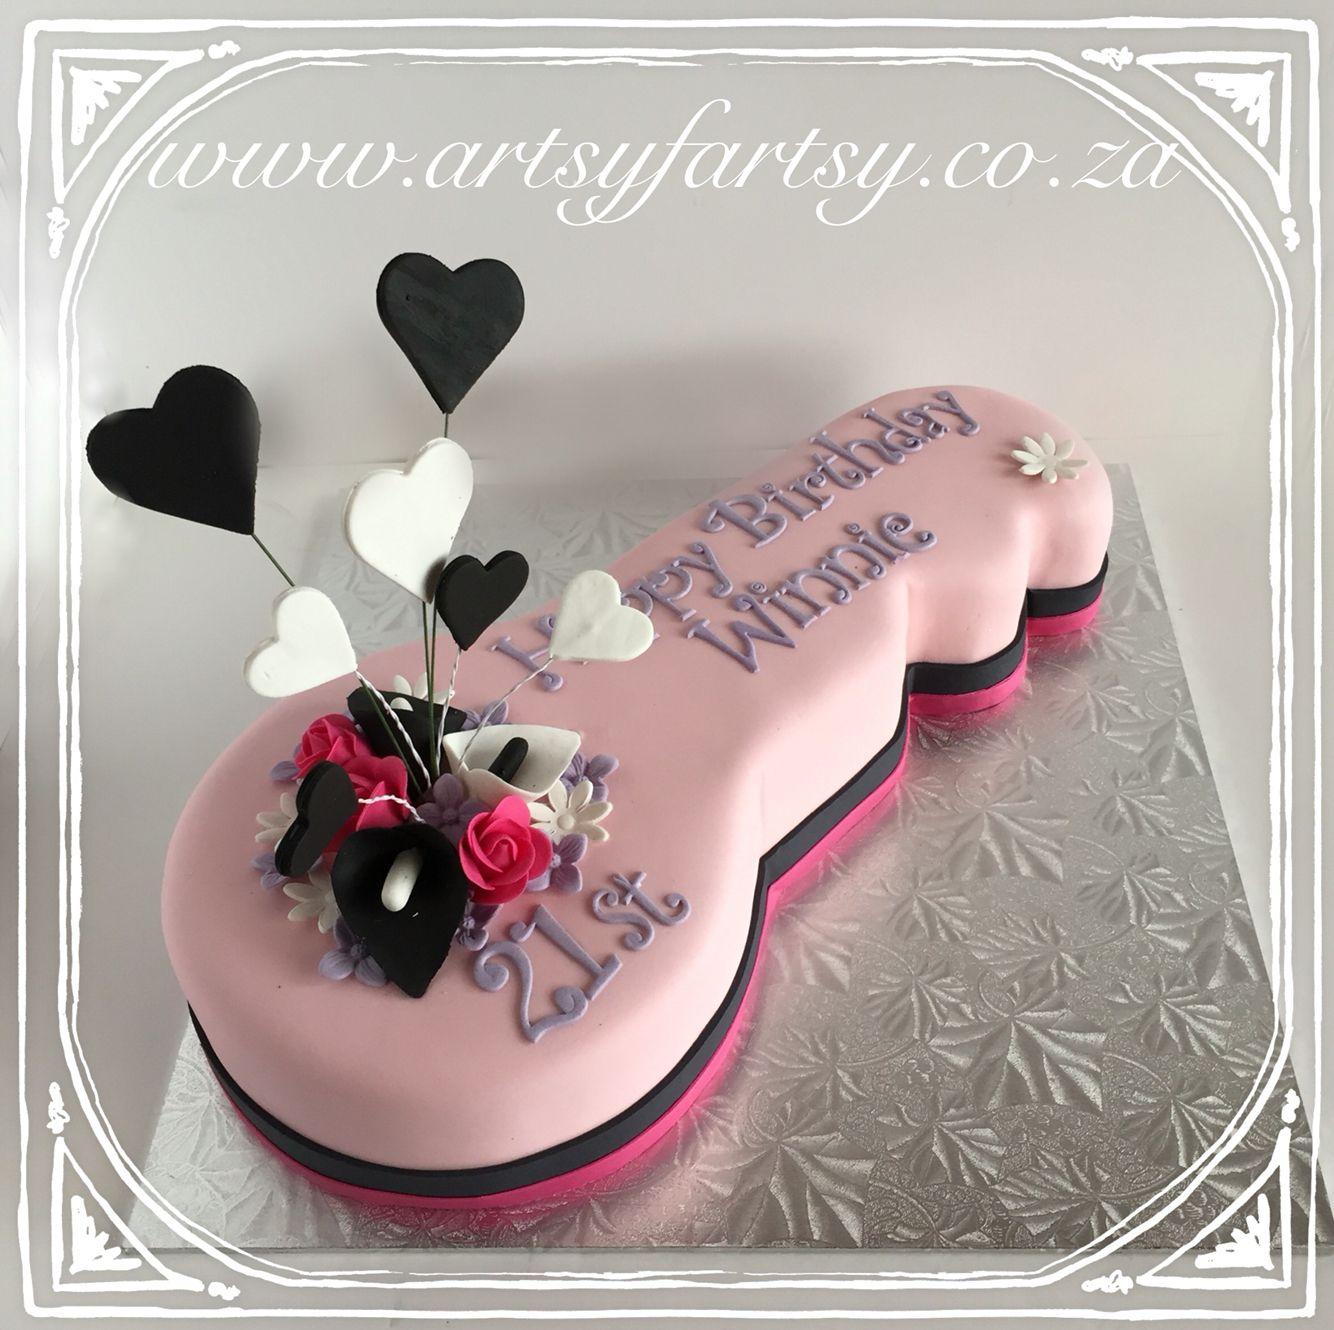 21st Birthday Key Cake 21stbirthdaykeycake Number Cakes And